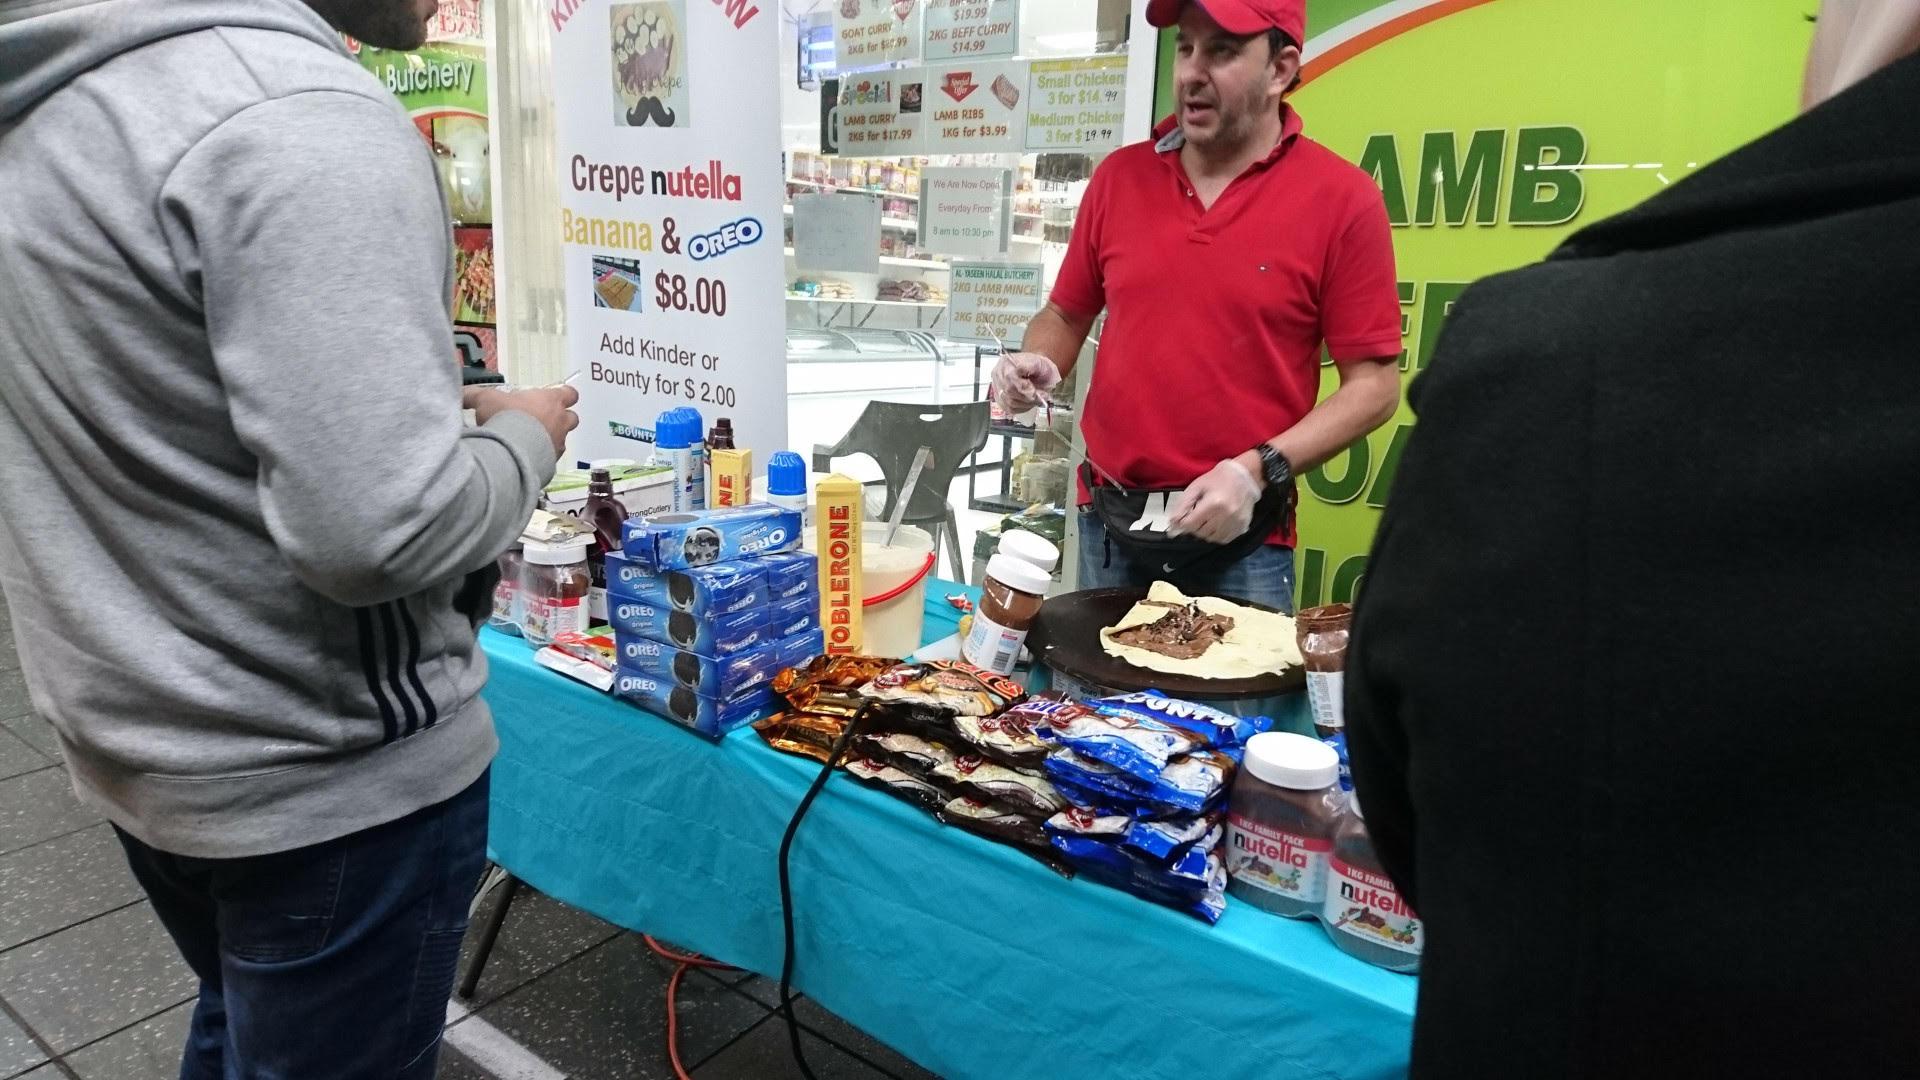 Lakemba Ramadan Food Festival 2018 - Explore Australia